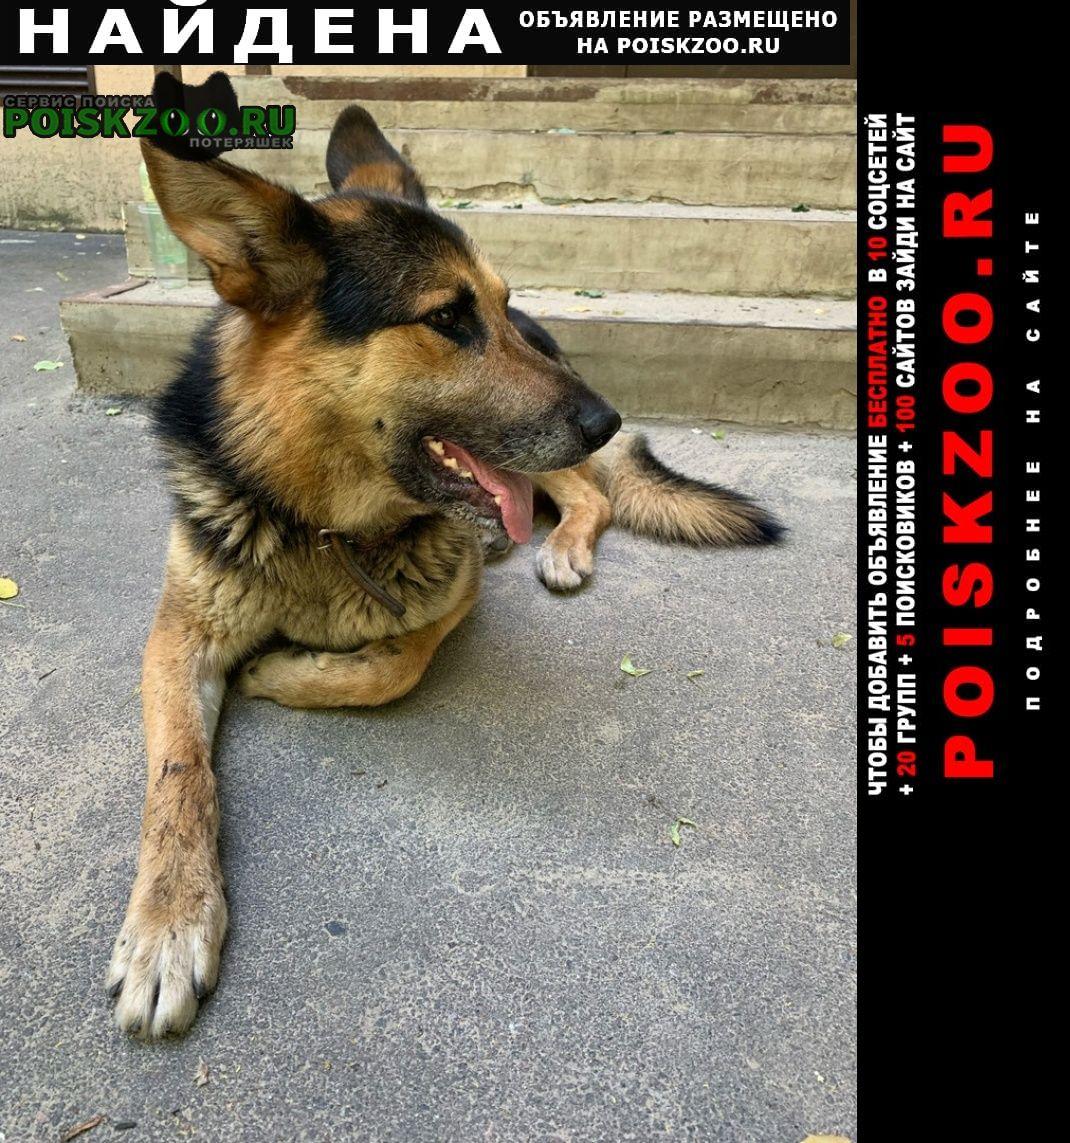 Найдена собака кобель немецкая овчарка Воронеж